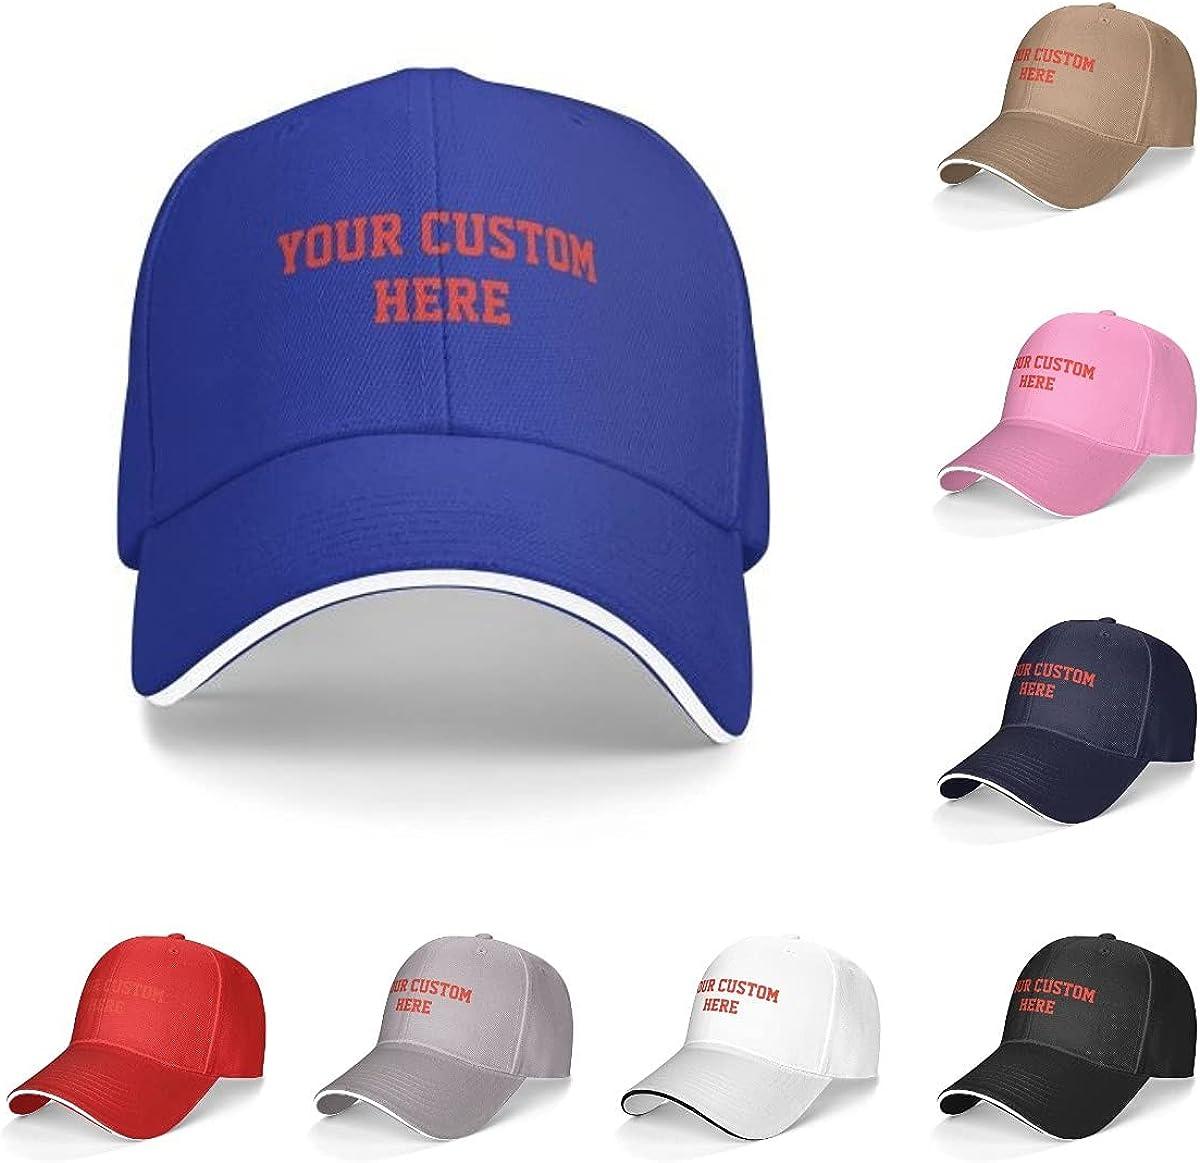 Custom Hats, Custom Baseball Hat, Design Your Own Hat,Soft Baseball Cap Custom Personalized Text Dad Hats for Men & Women